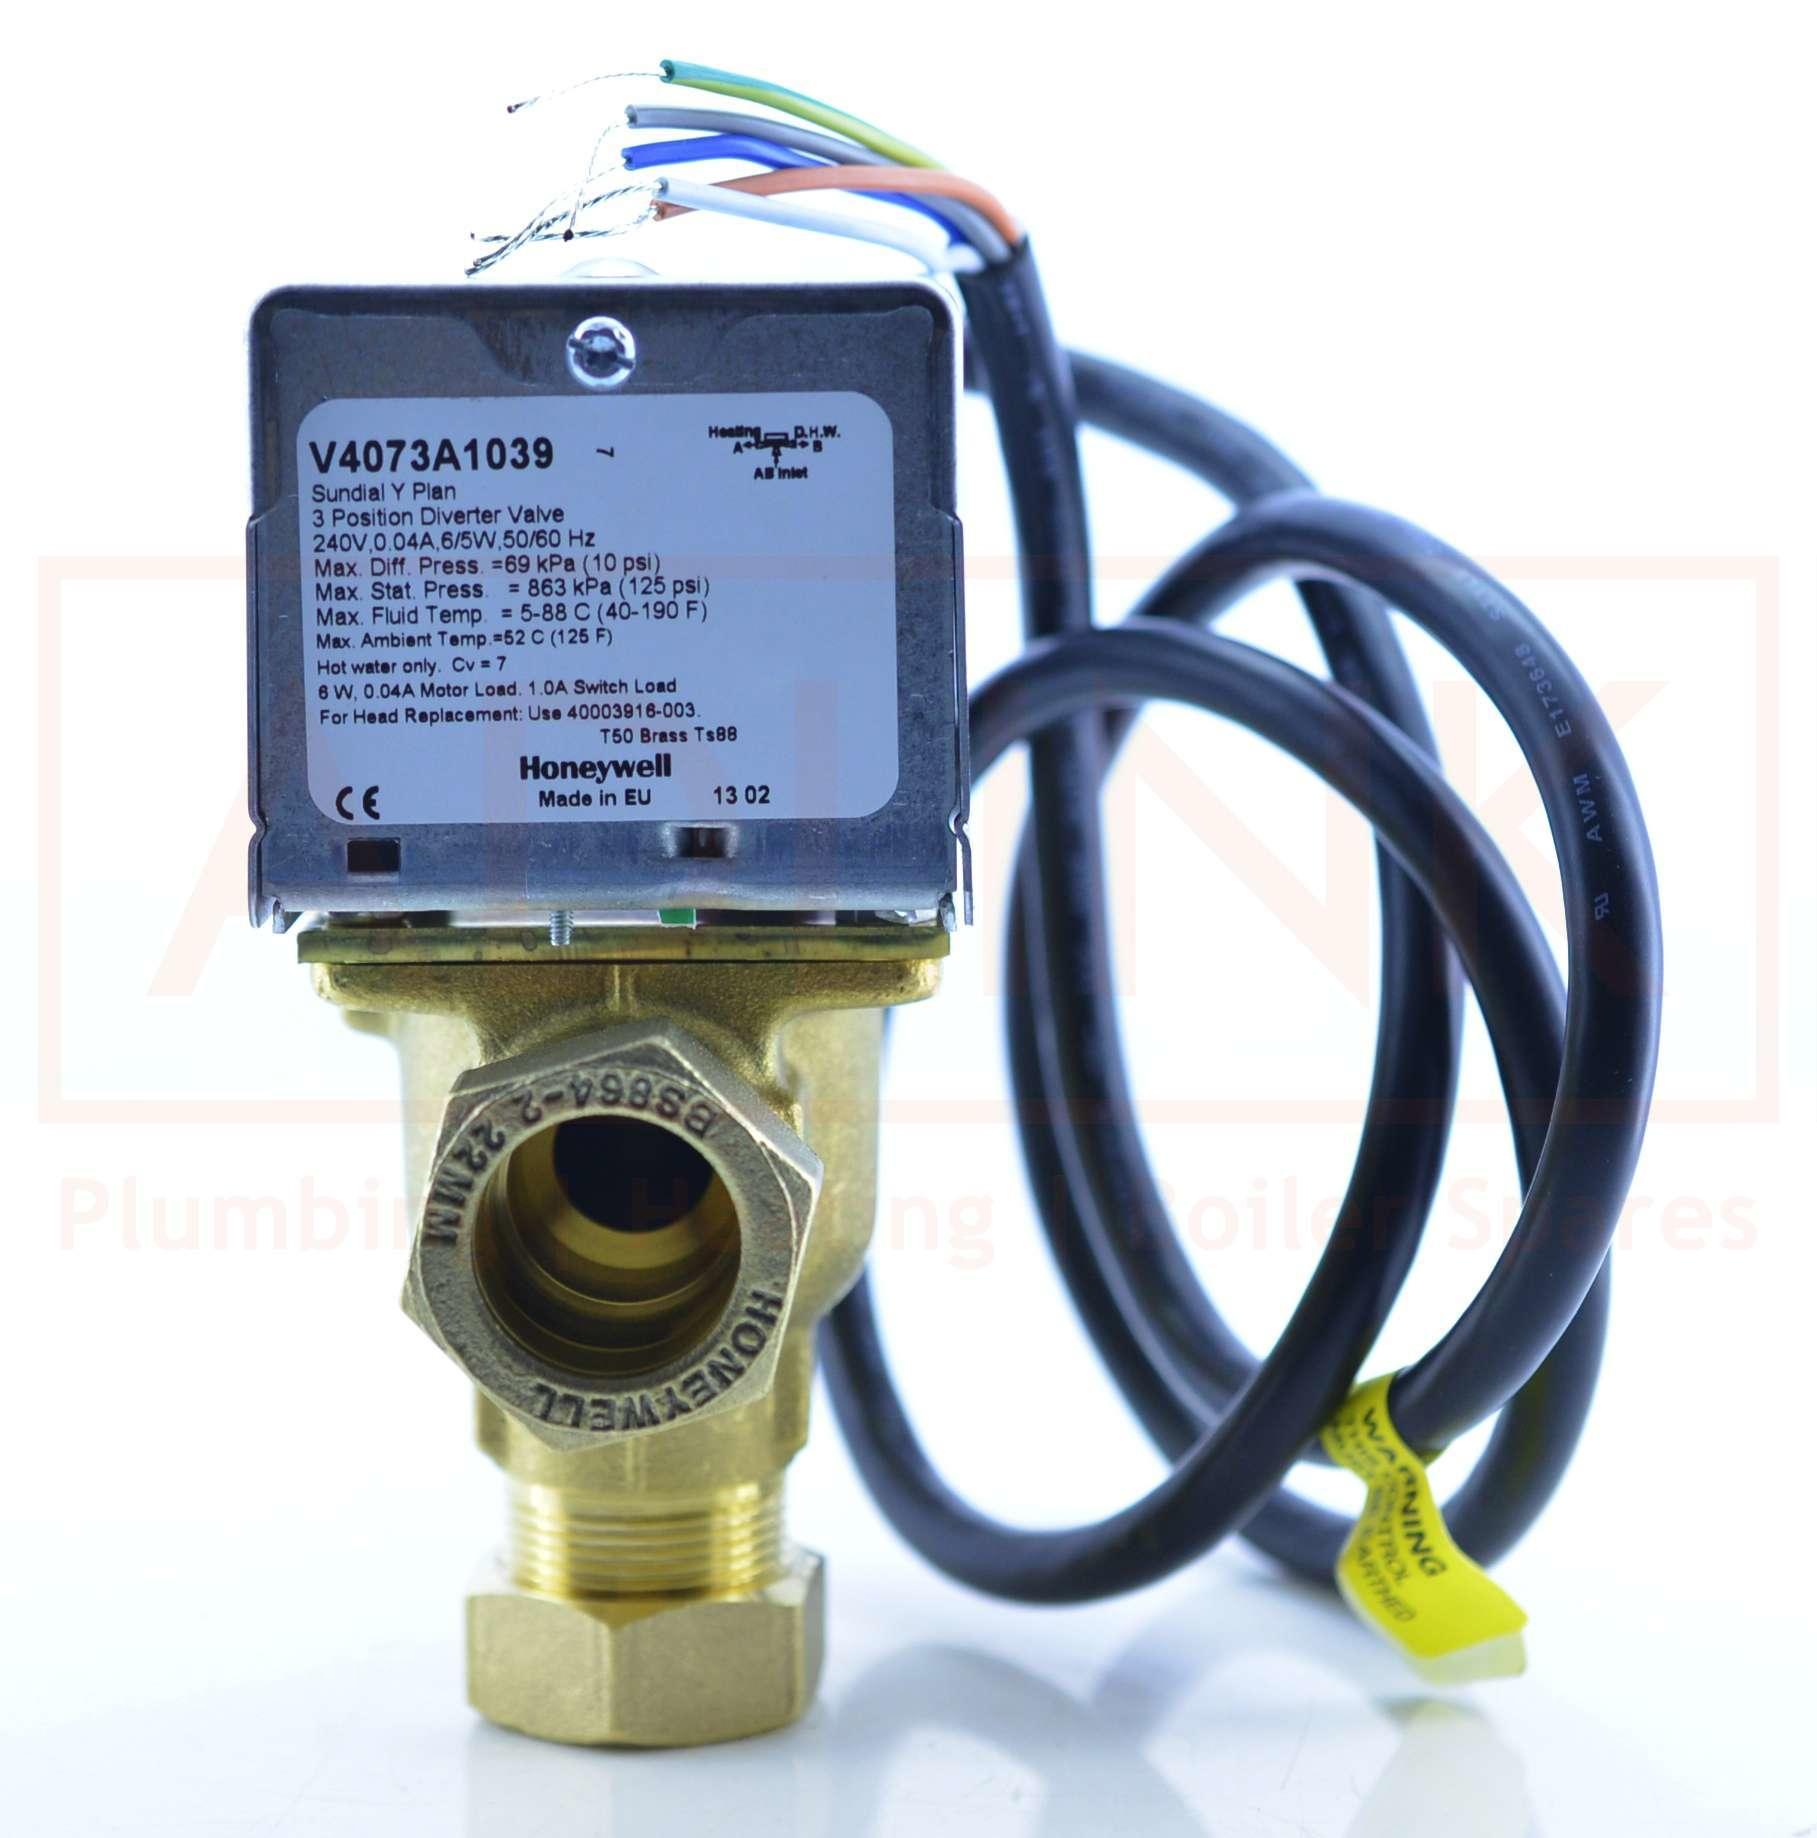 honeywell 3 port valve 22mm 5 wire v4073a 1039 rh adlink co uk